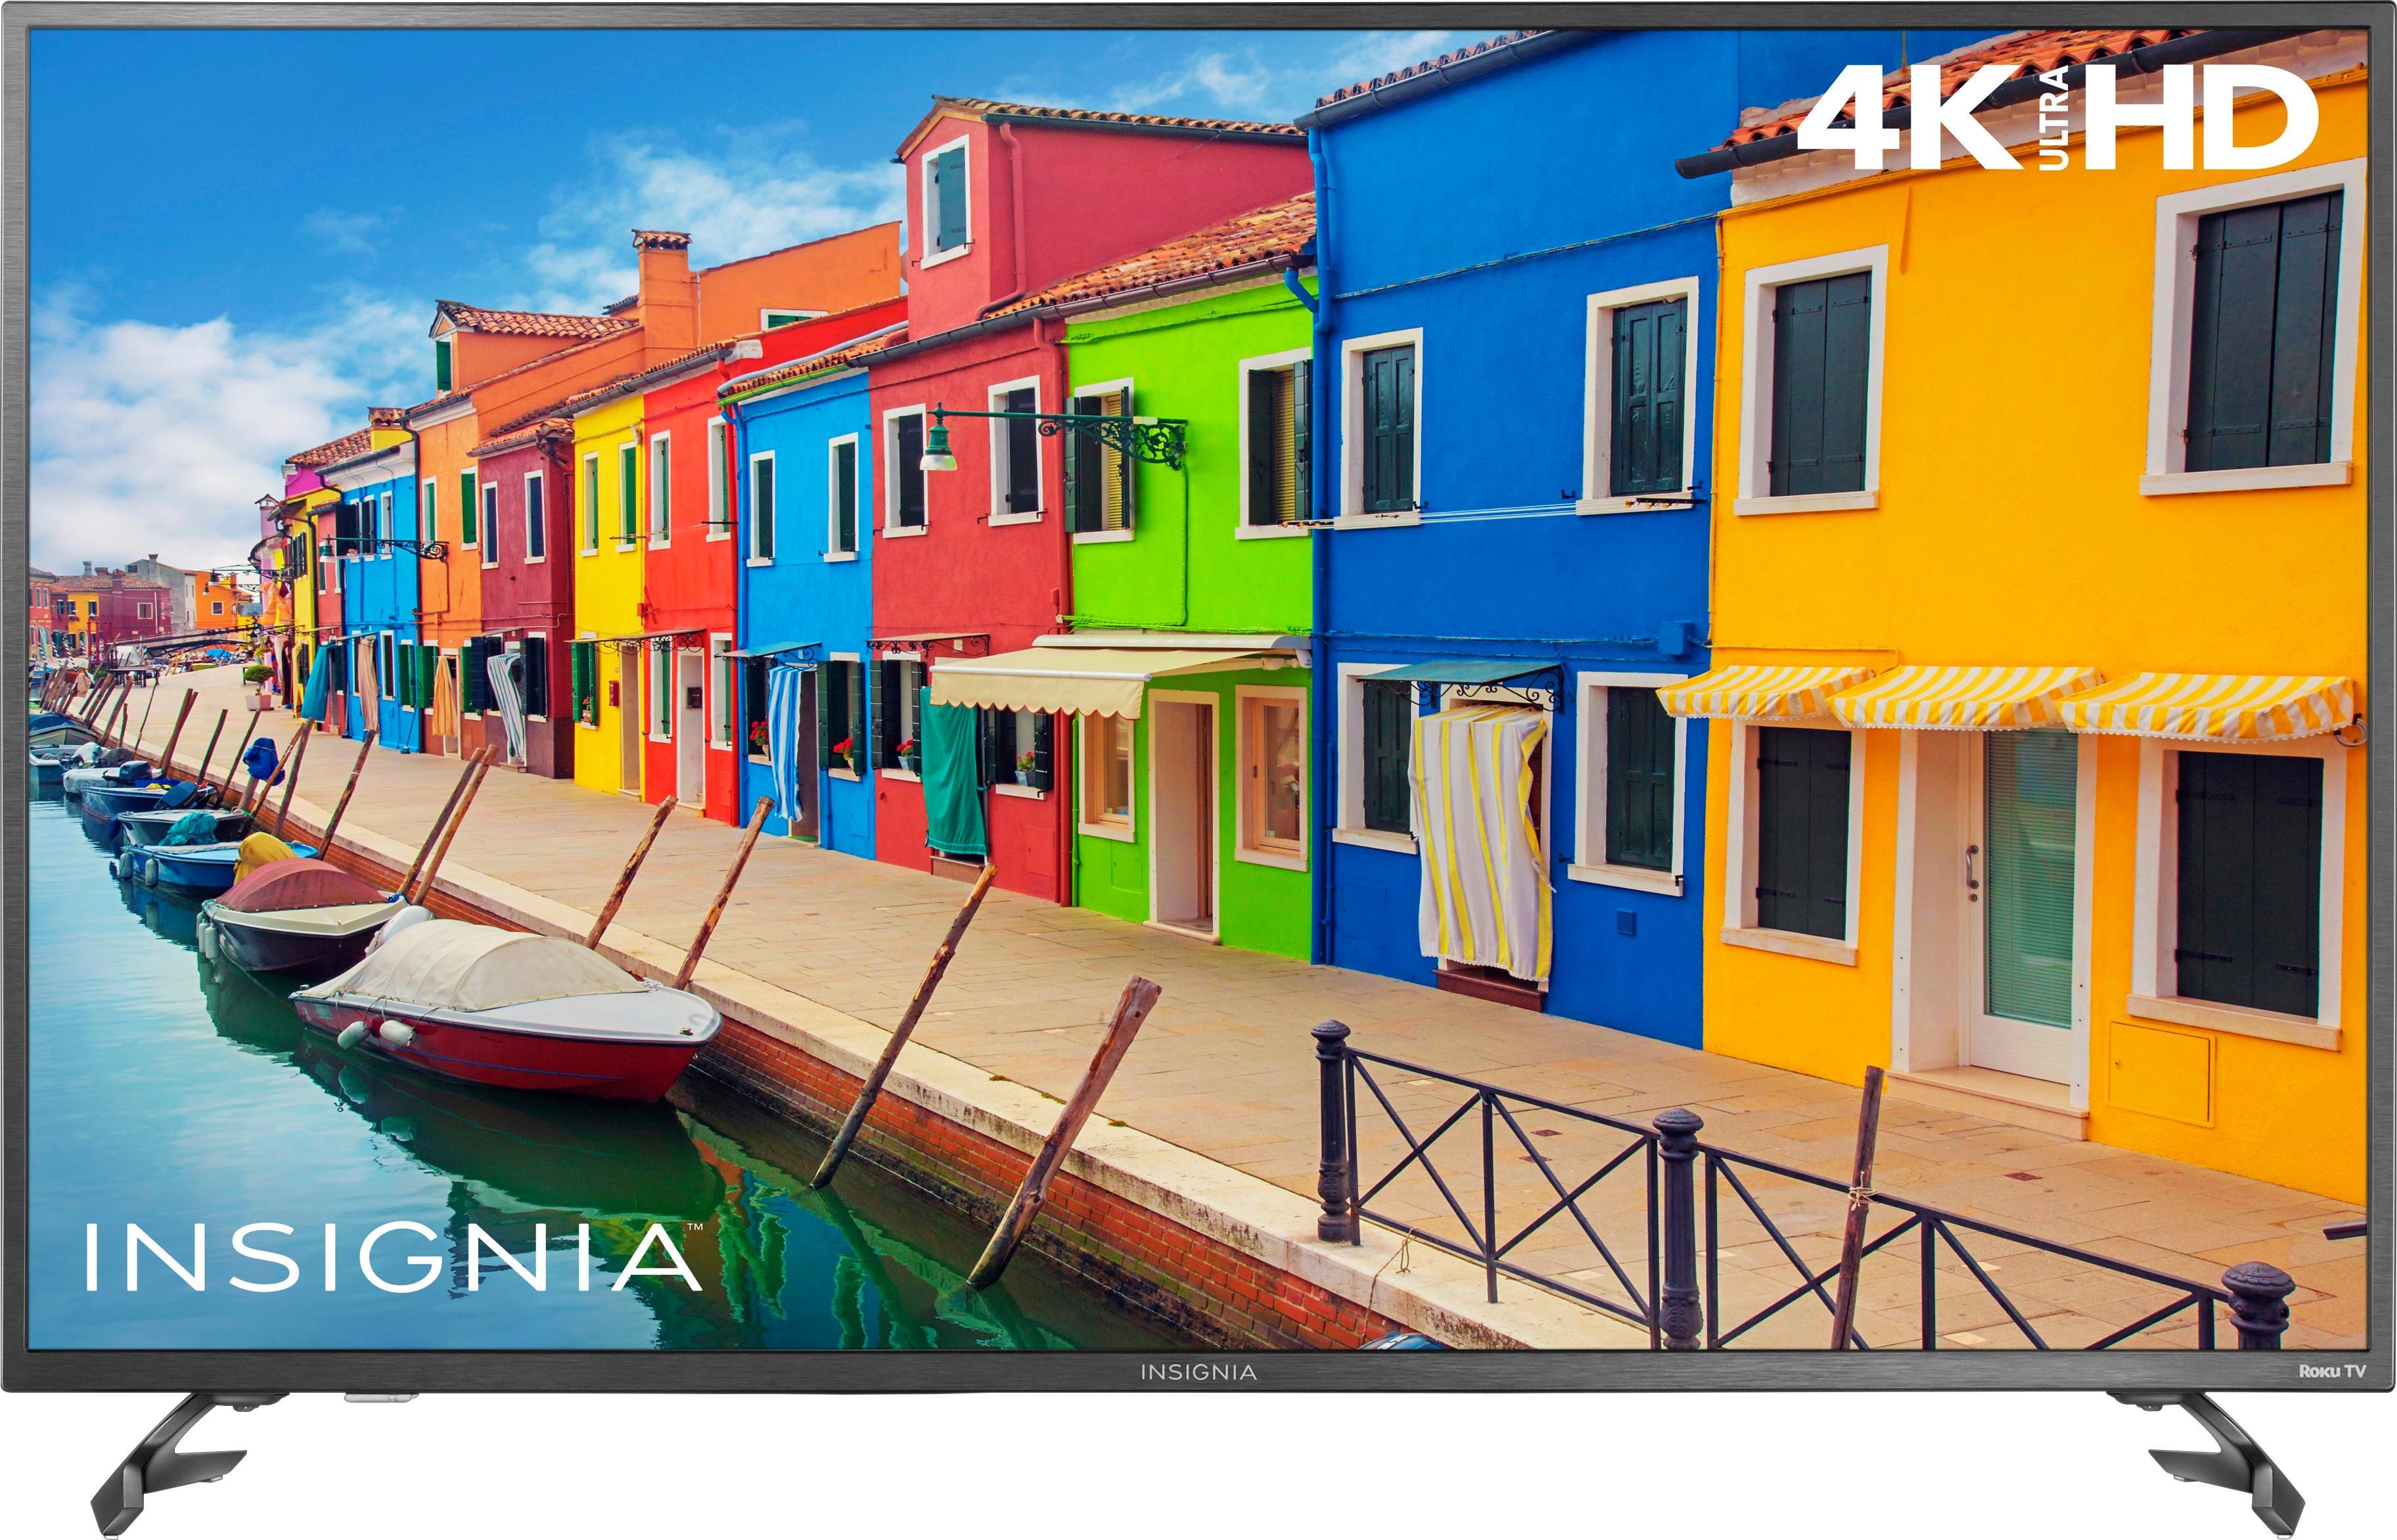 Sharp LC-50LBU591U 50-Inch HDR 4K LED 60Hz TV | Your TV Set